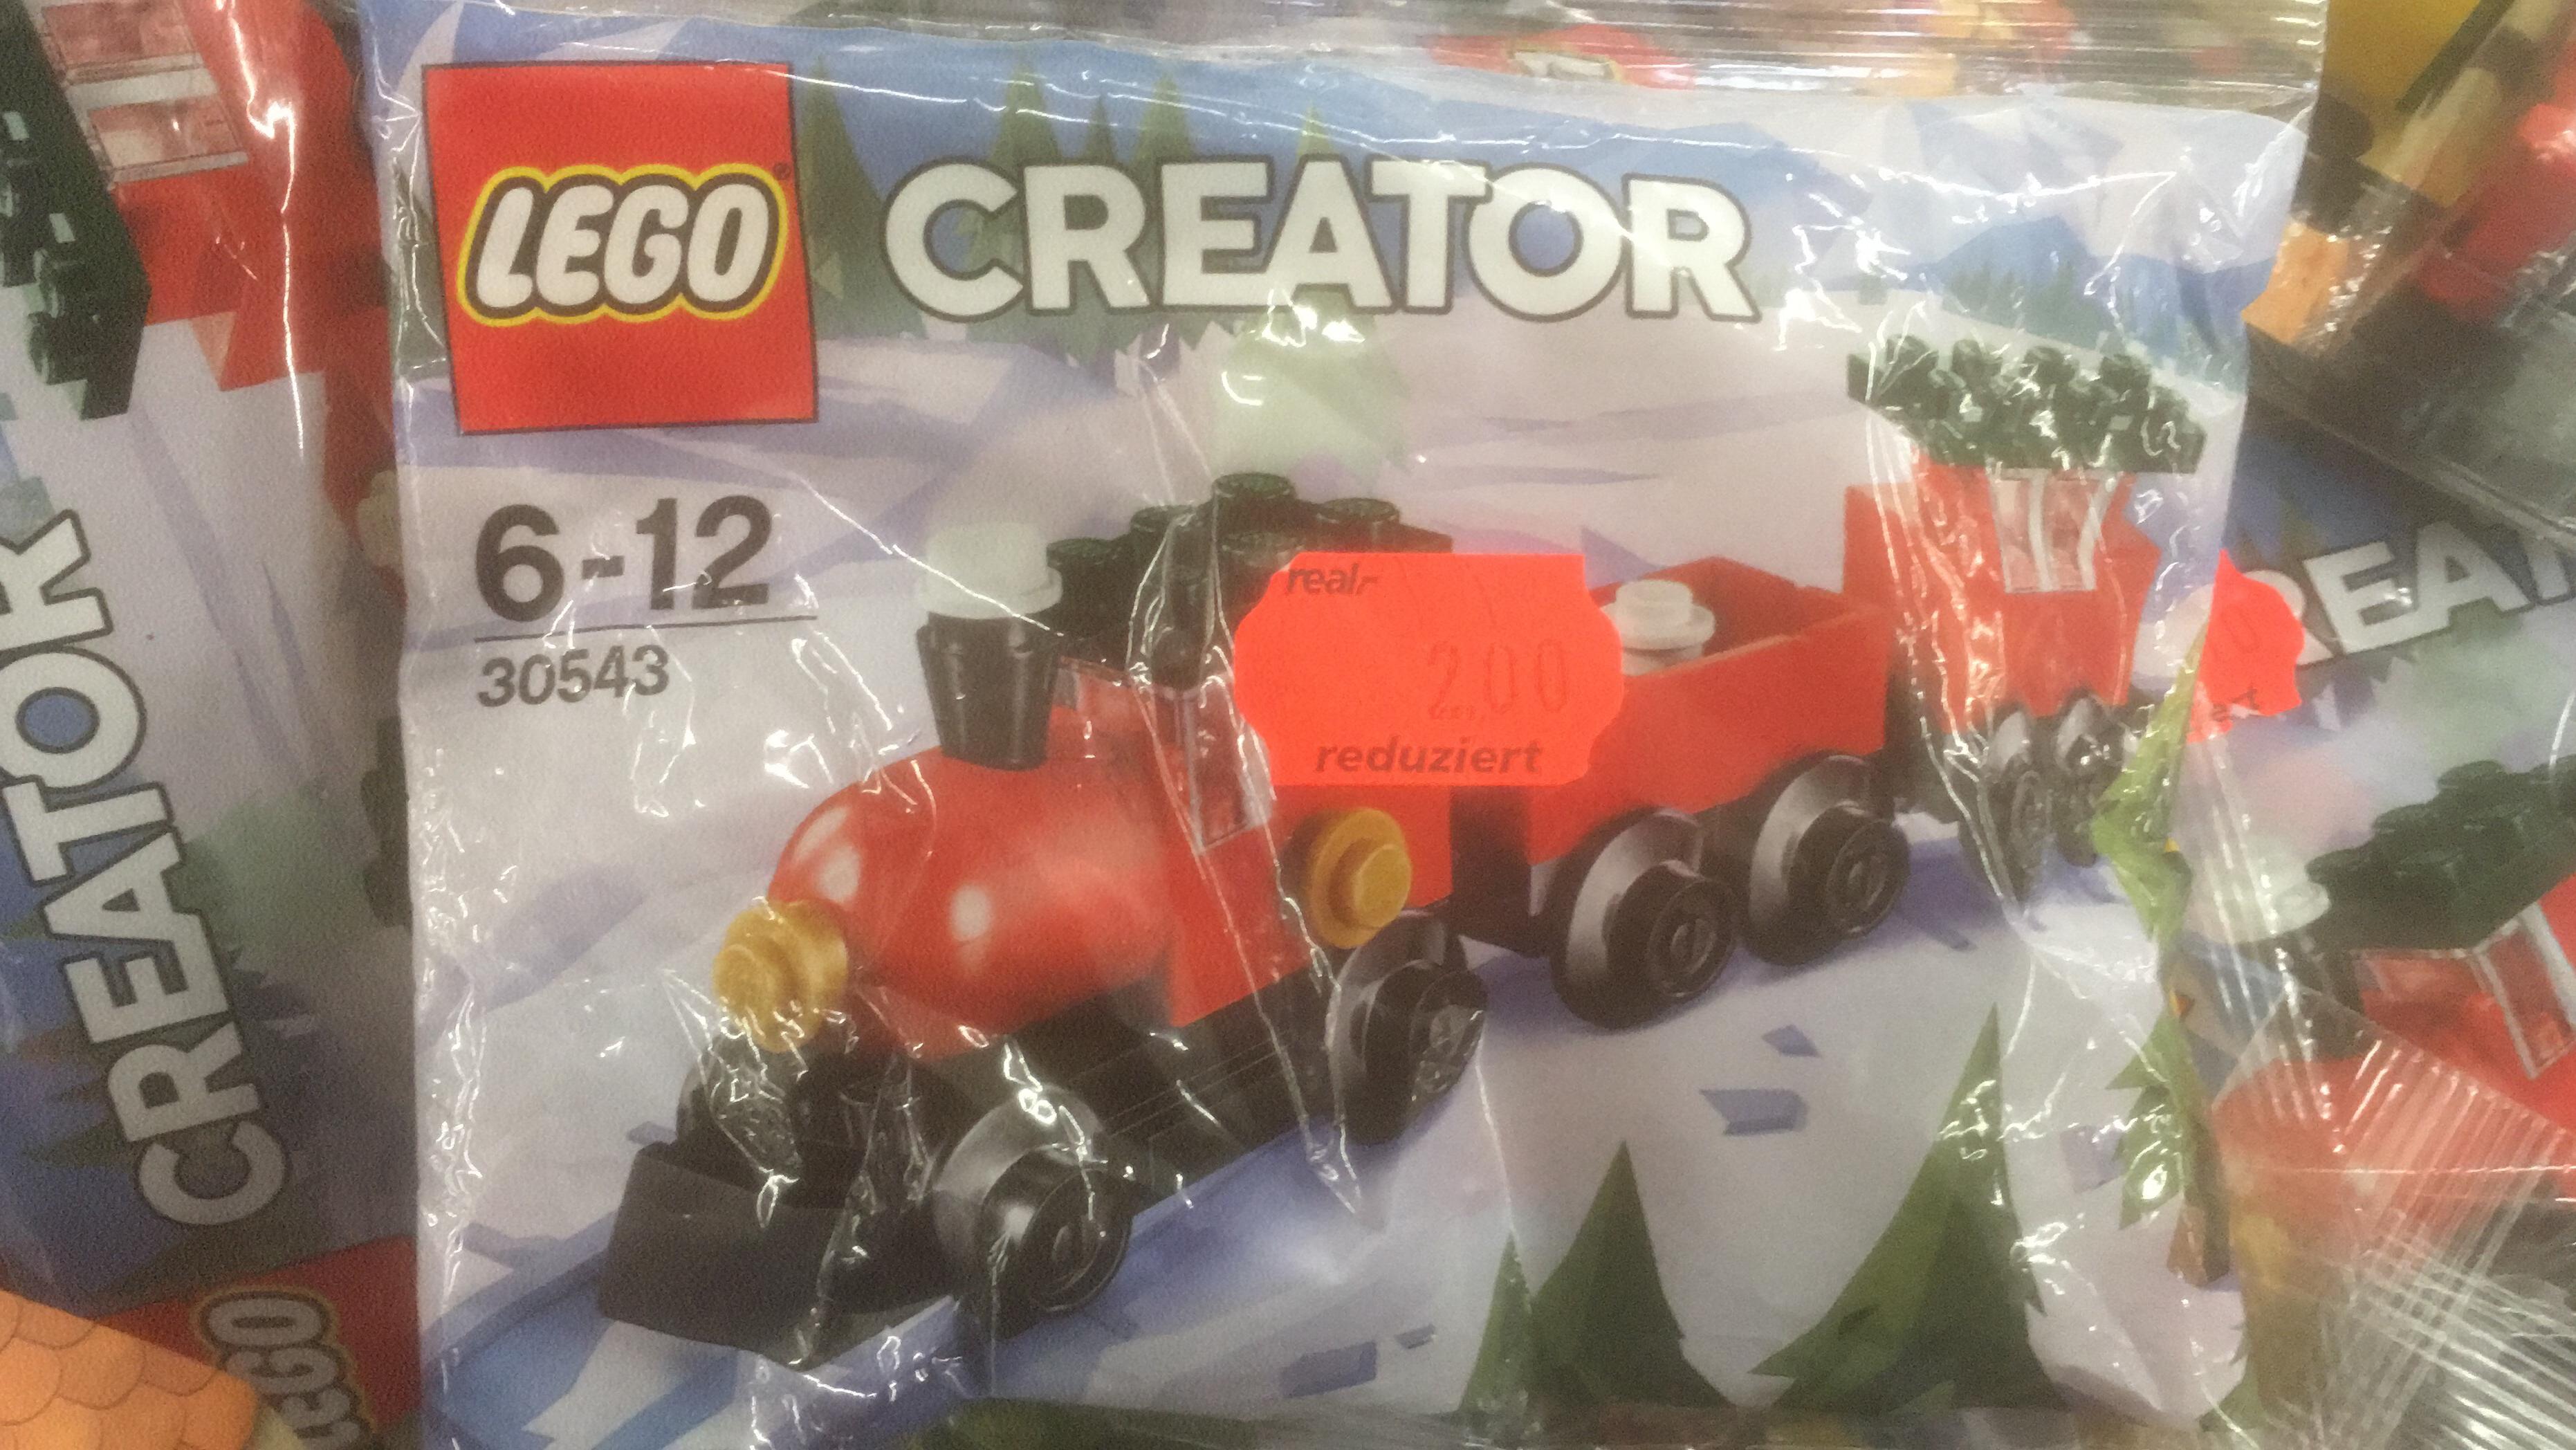 Lego 30543 Creator Weihnachts-Lok Polybag  / EOL / Lokal / Köln